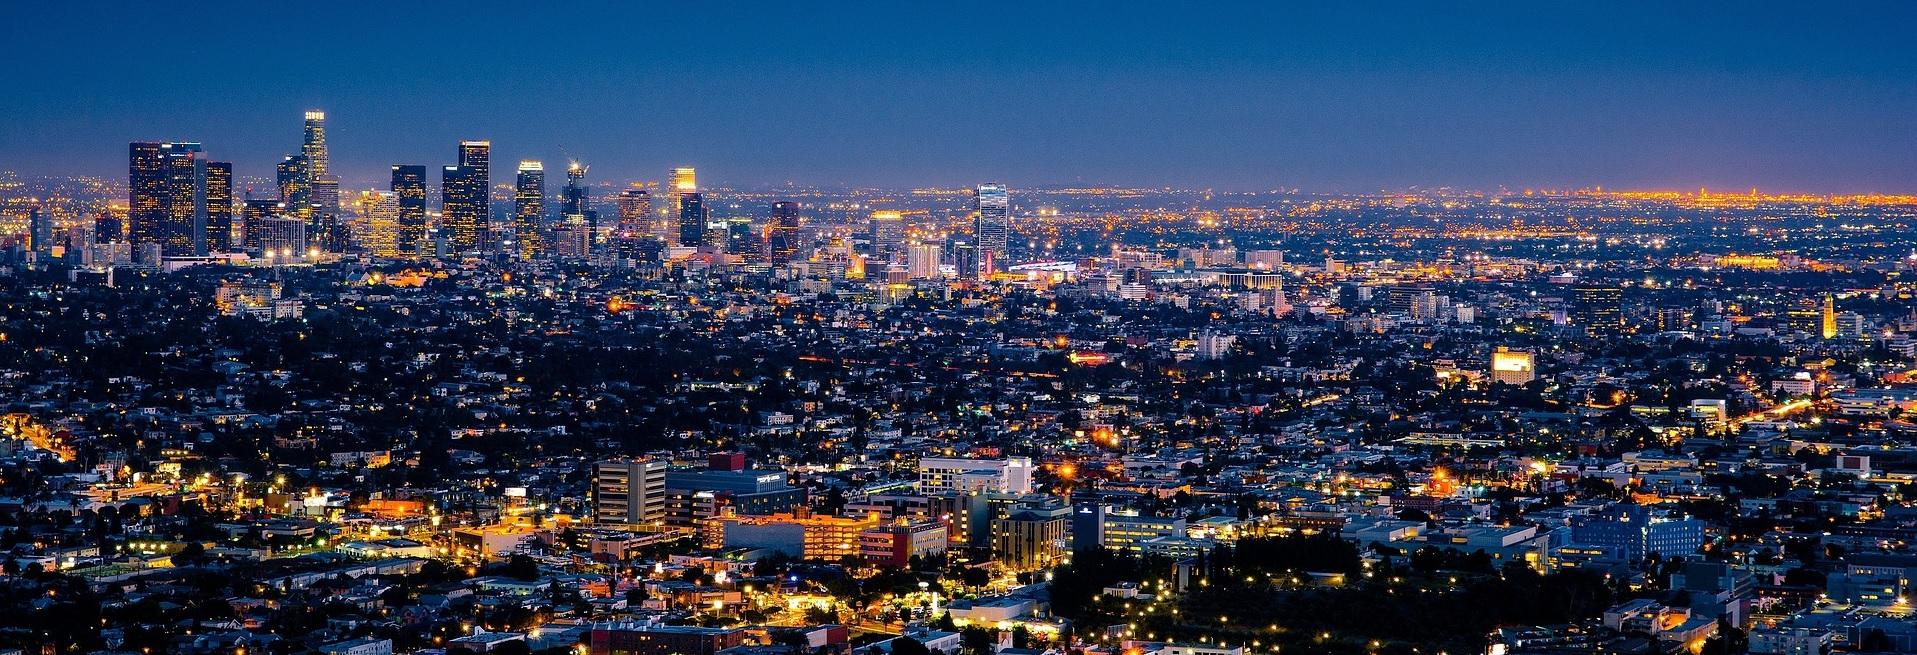 Overblikk Los Angeles